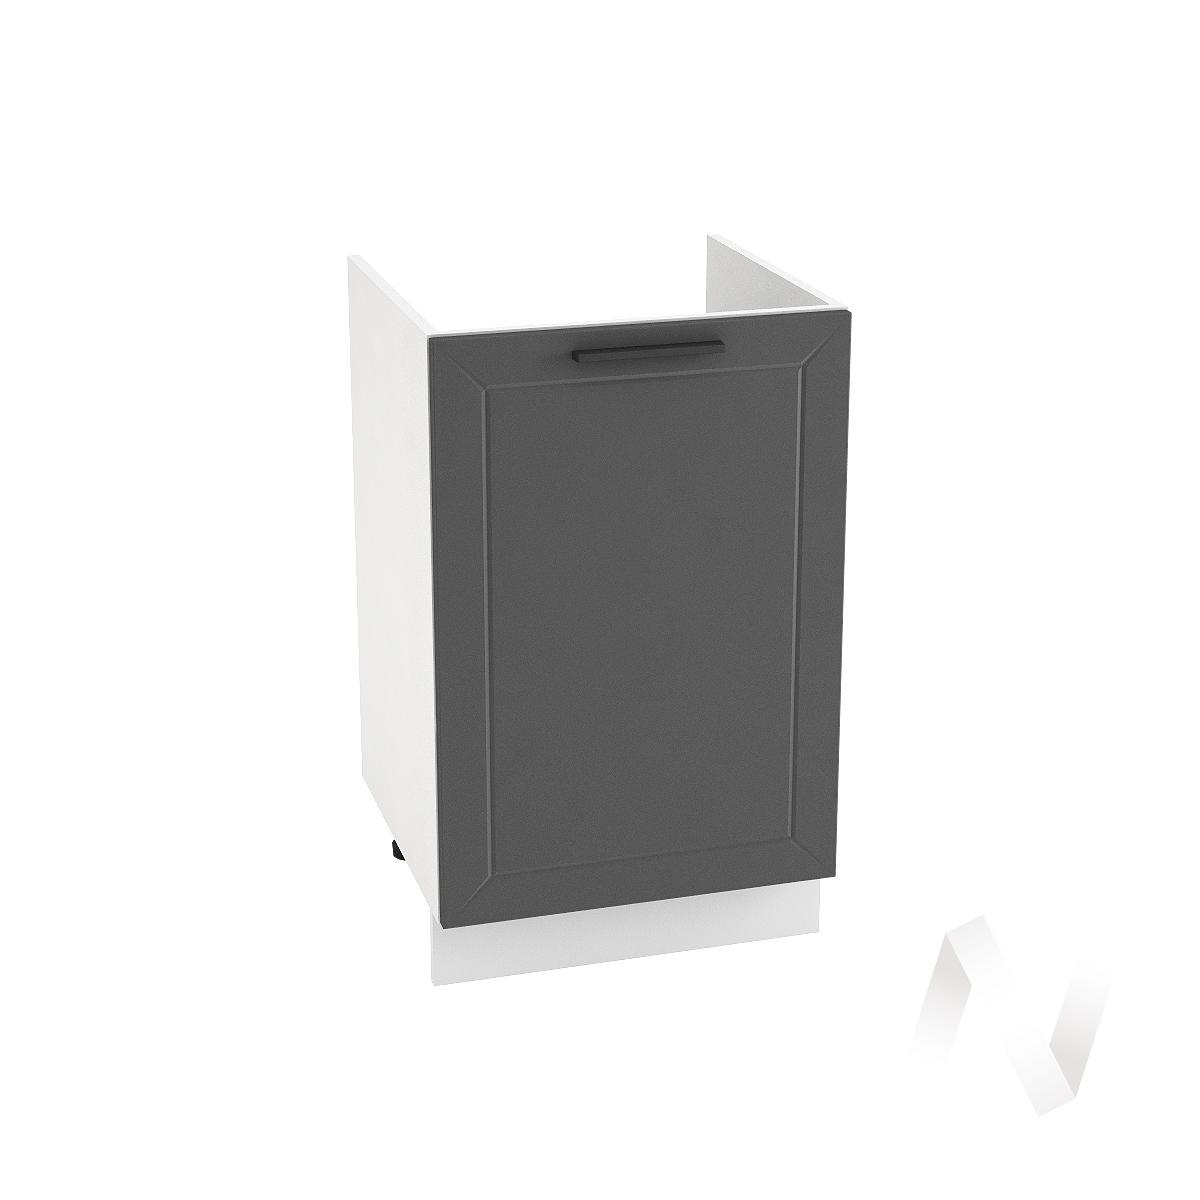 "Кухня ""Глетчер"": Шкаф нижний под мойку 500, ШНМ 500 (Маренго силк/корпус белый)"